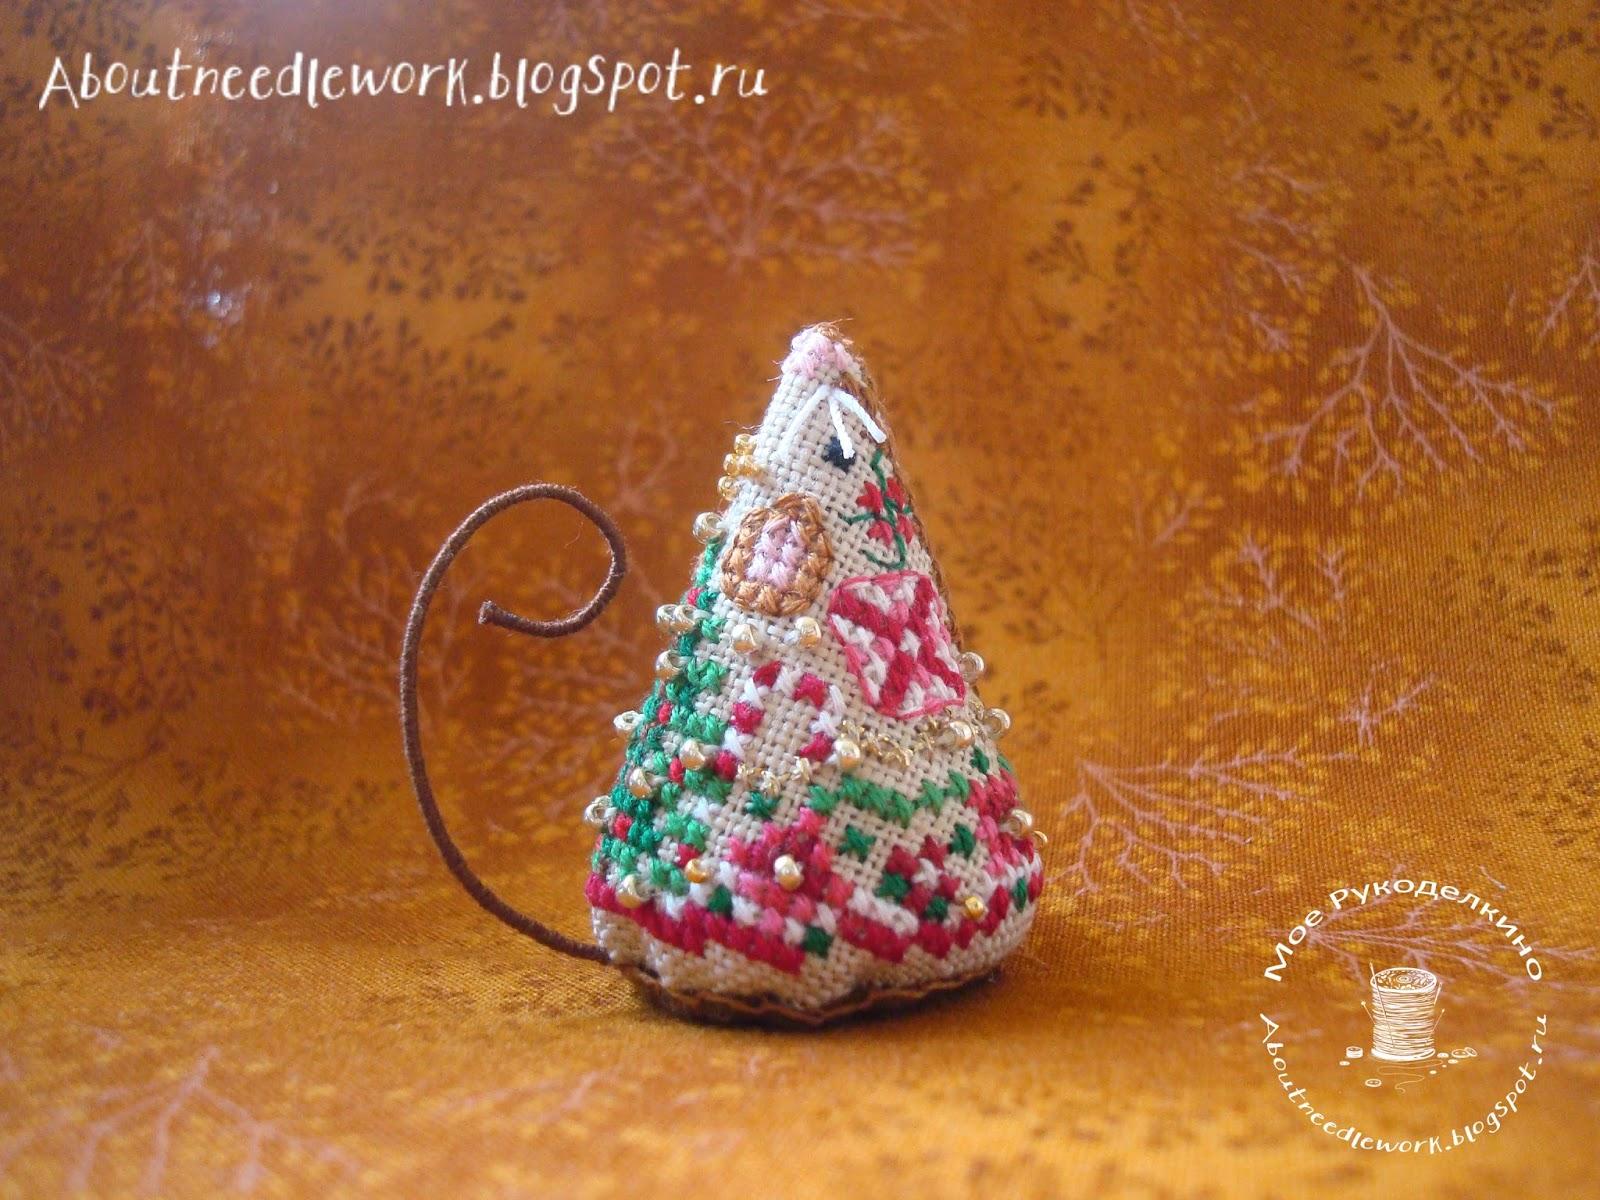 Мышка Gingerbread Mouse от Just Nan